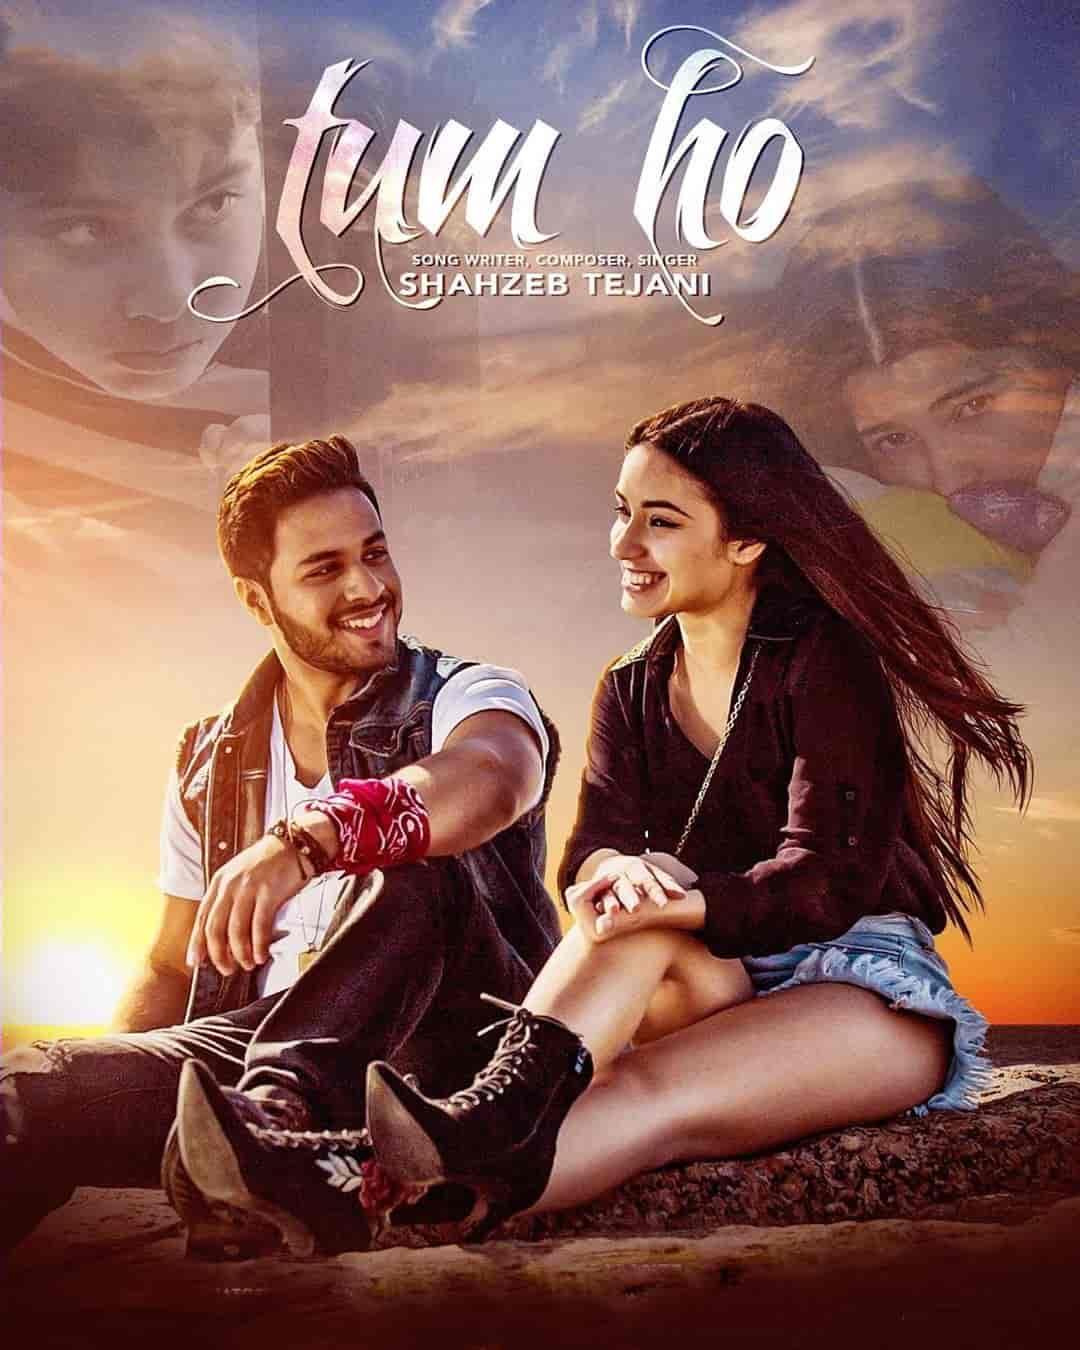 Tum Ho Hindi Song Image By Shahzeb Tejani features Joyce Escalante